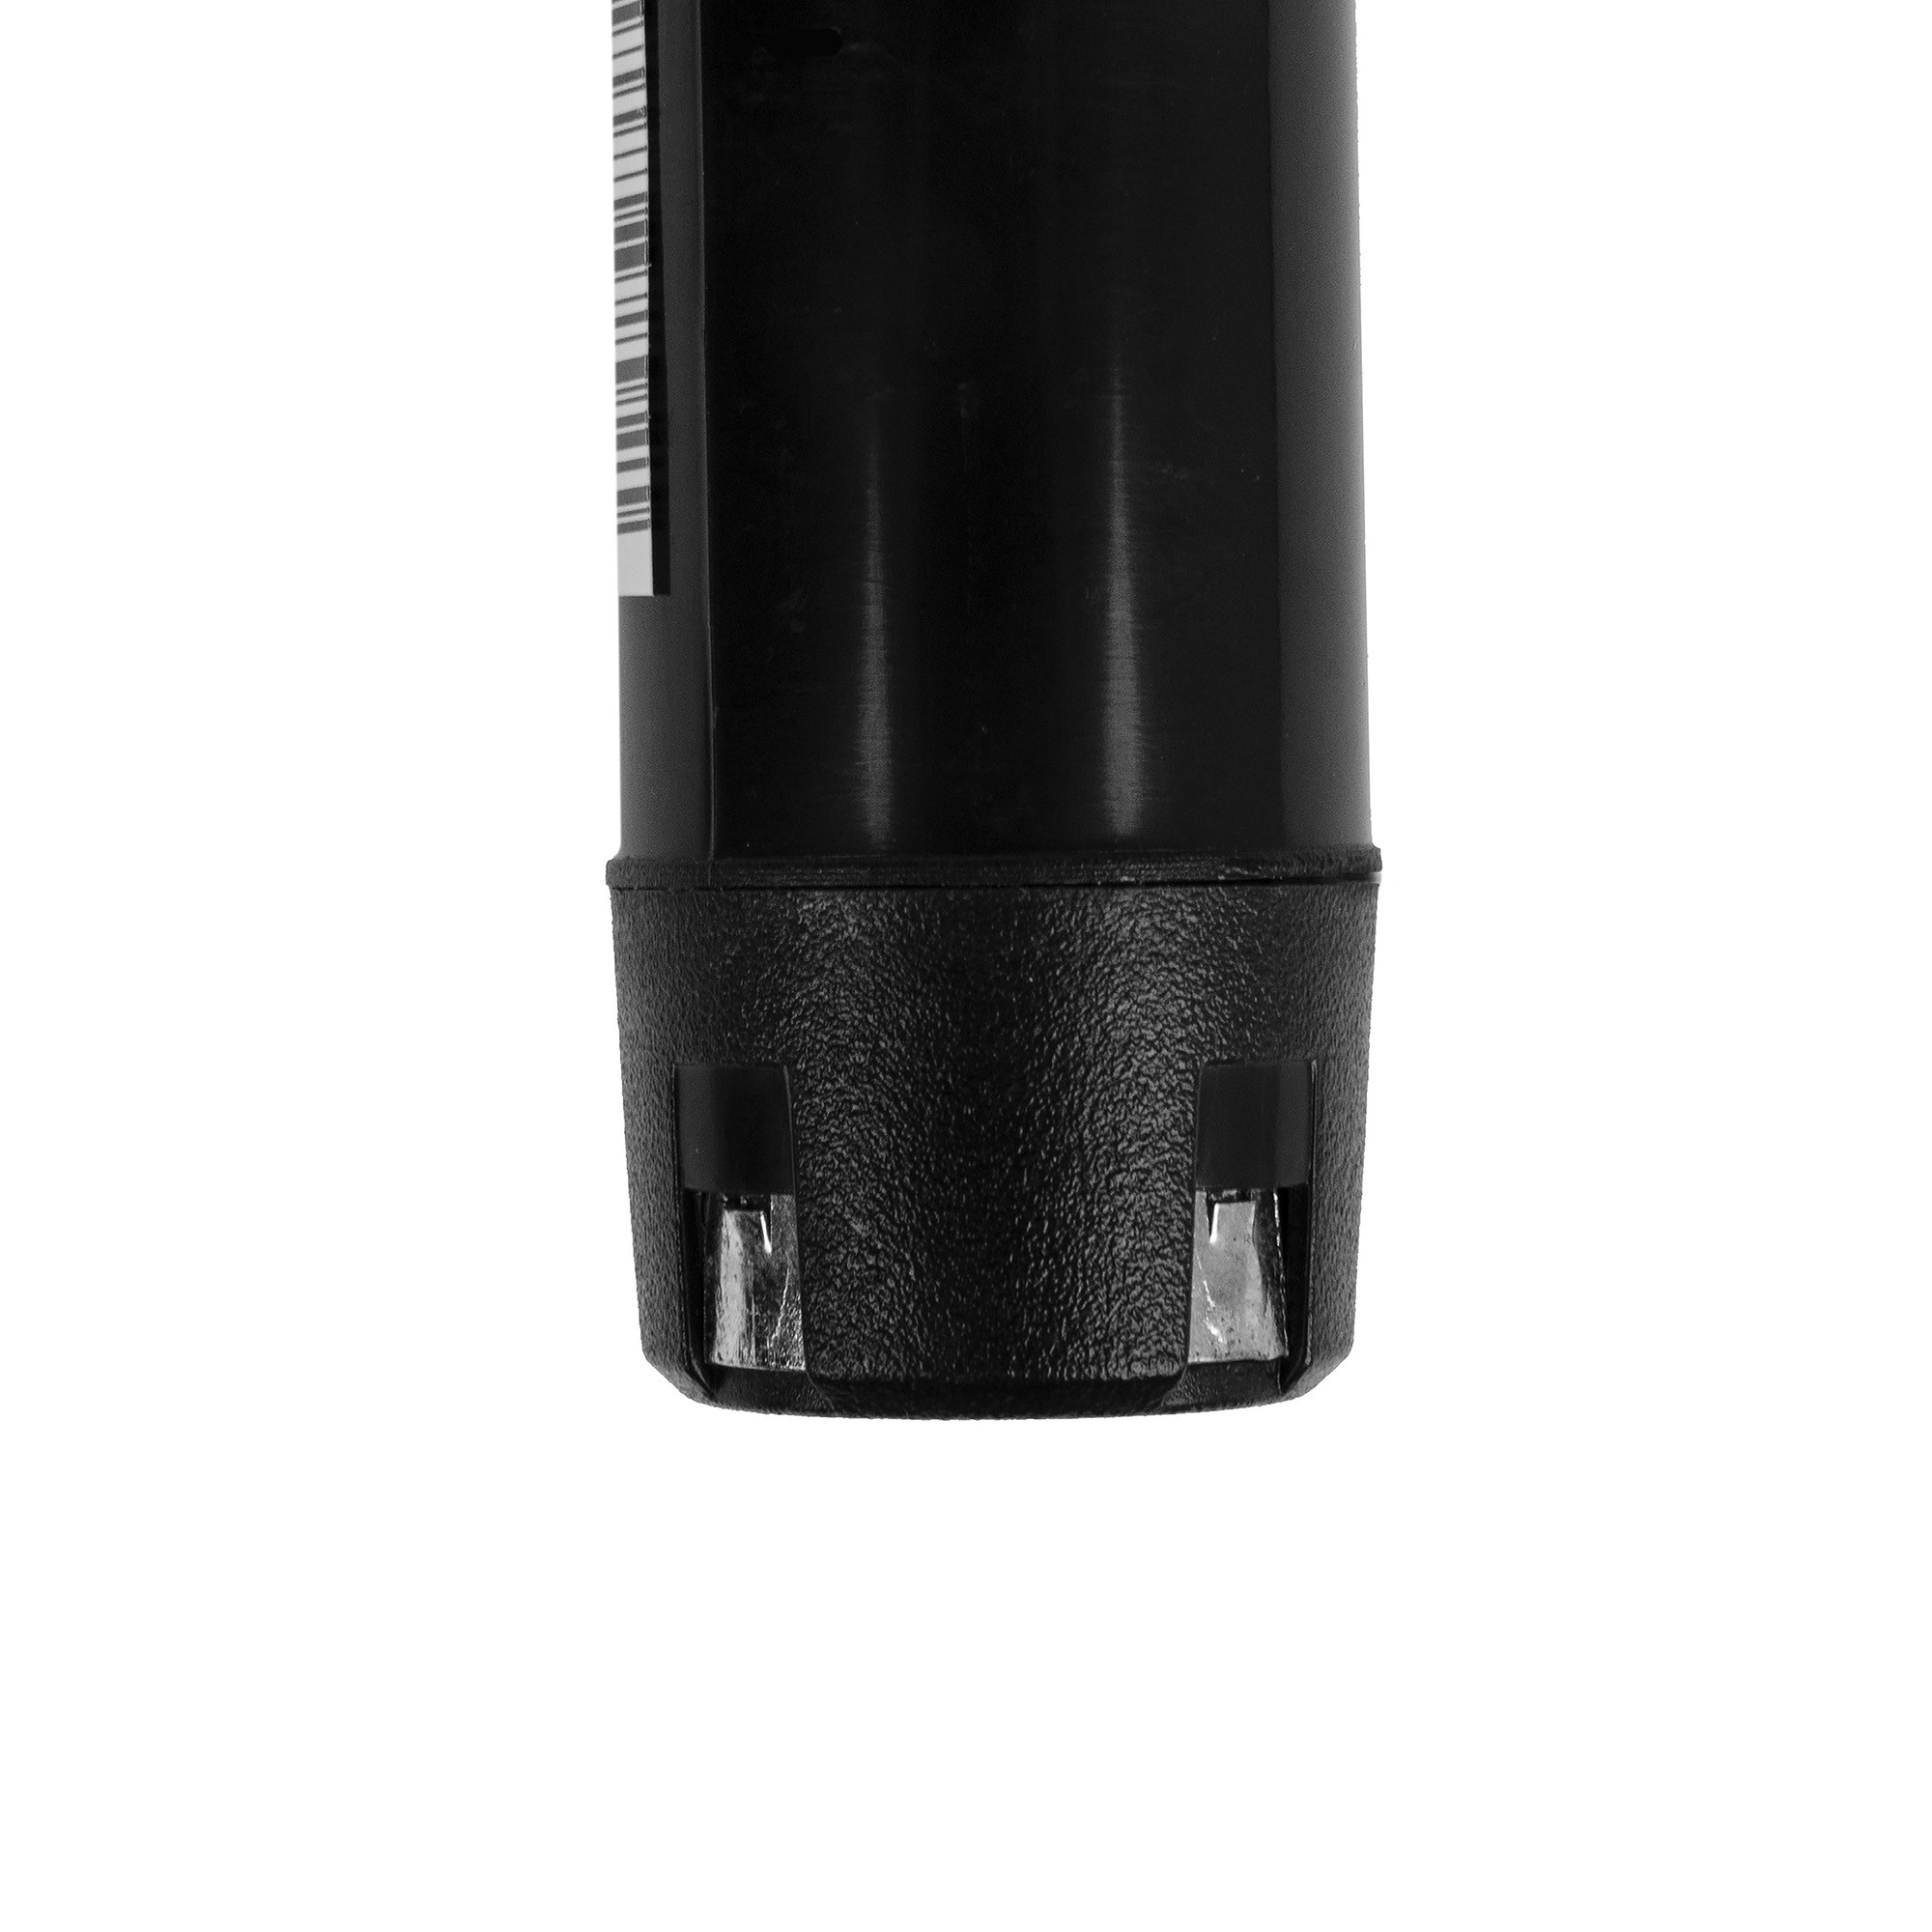 Baterie Green Cell Ryobi AP4001 AP4003 Ryobi HP53L HP54L RP4000 RP4010 RP4020 RP4030 RP4401 4V 2000mAh Li-ion - neoriginální